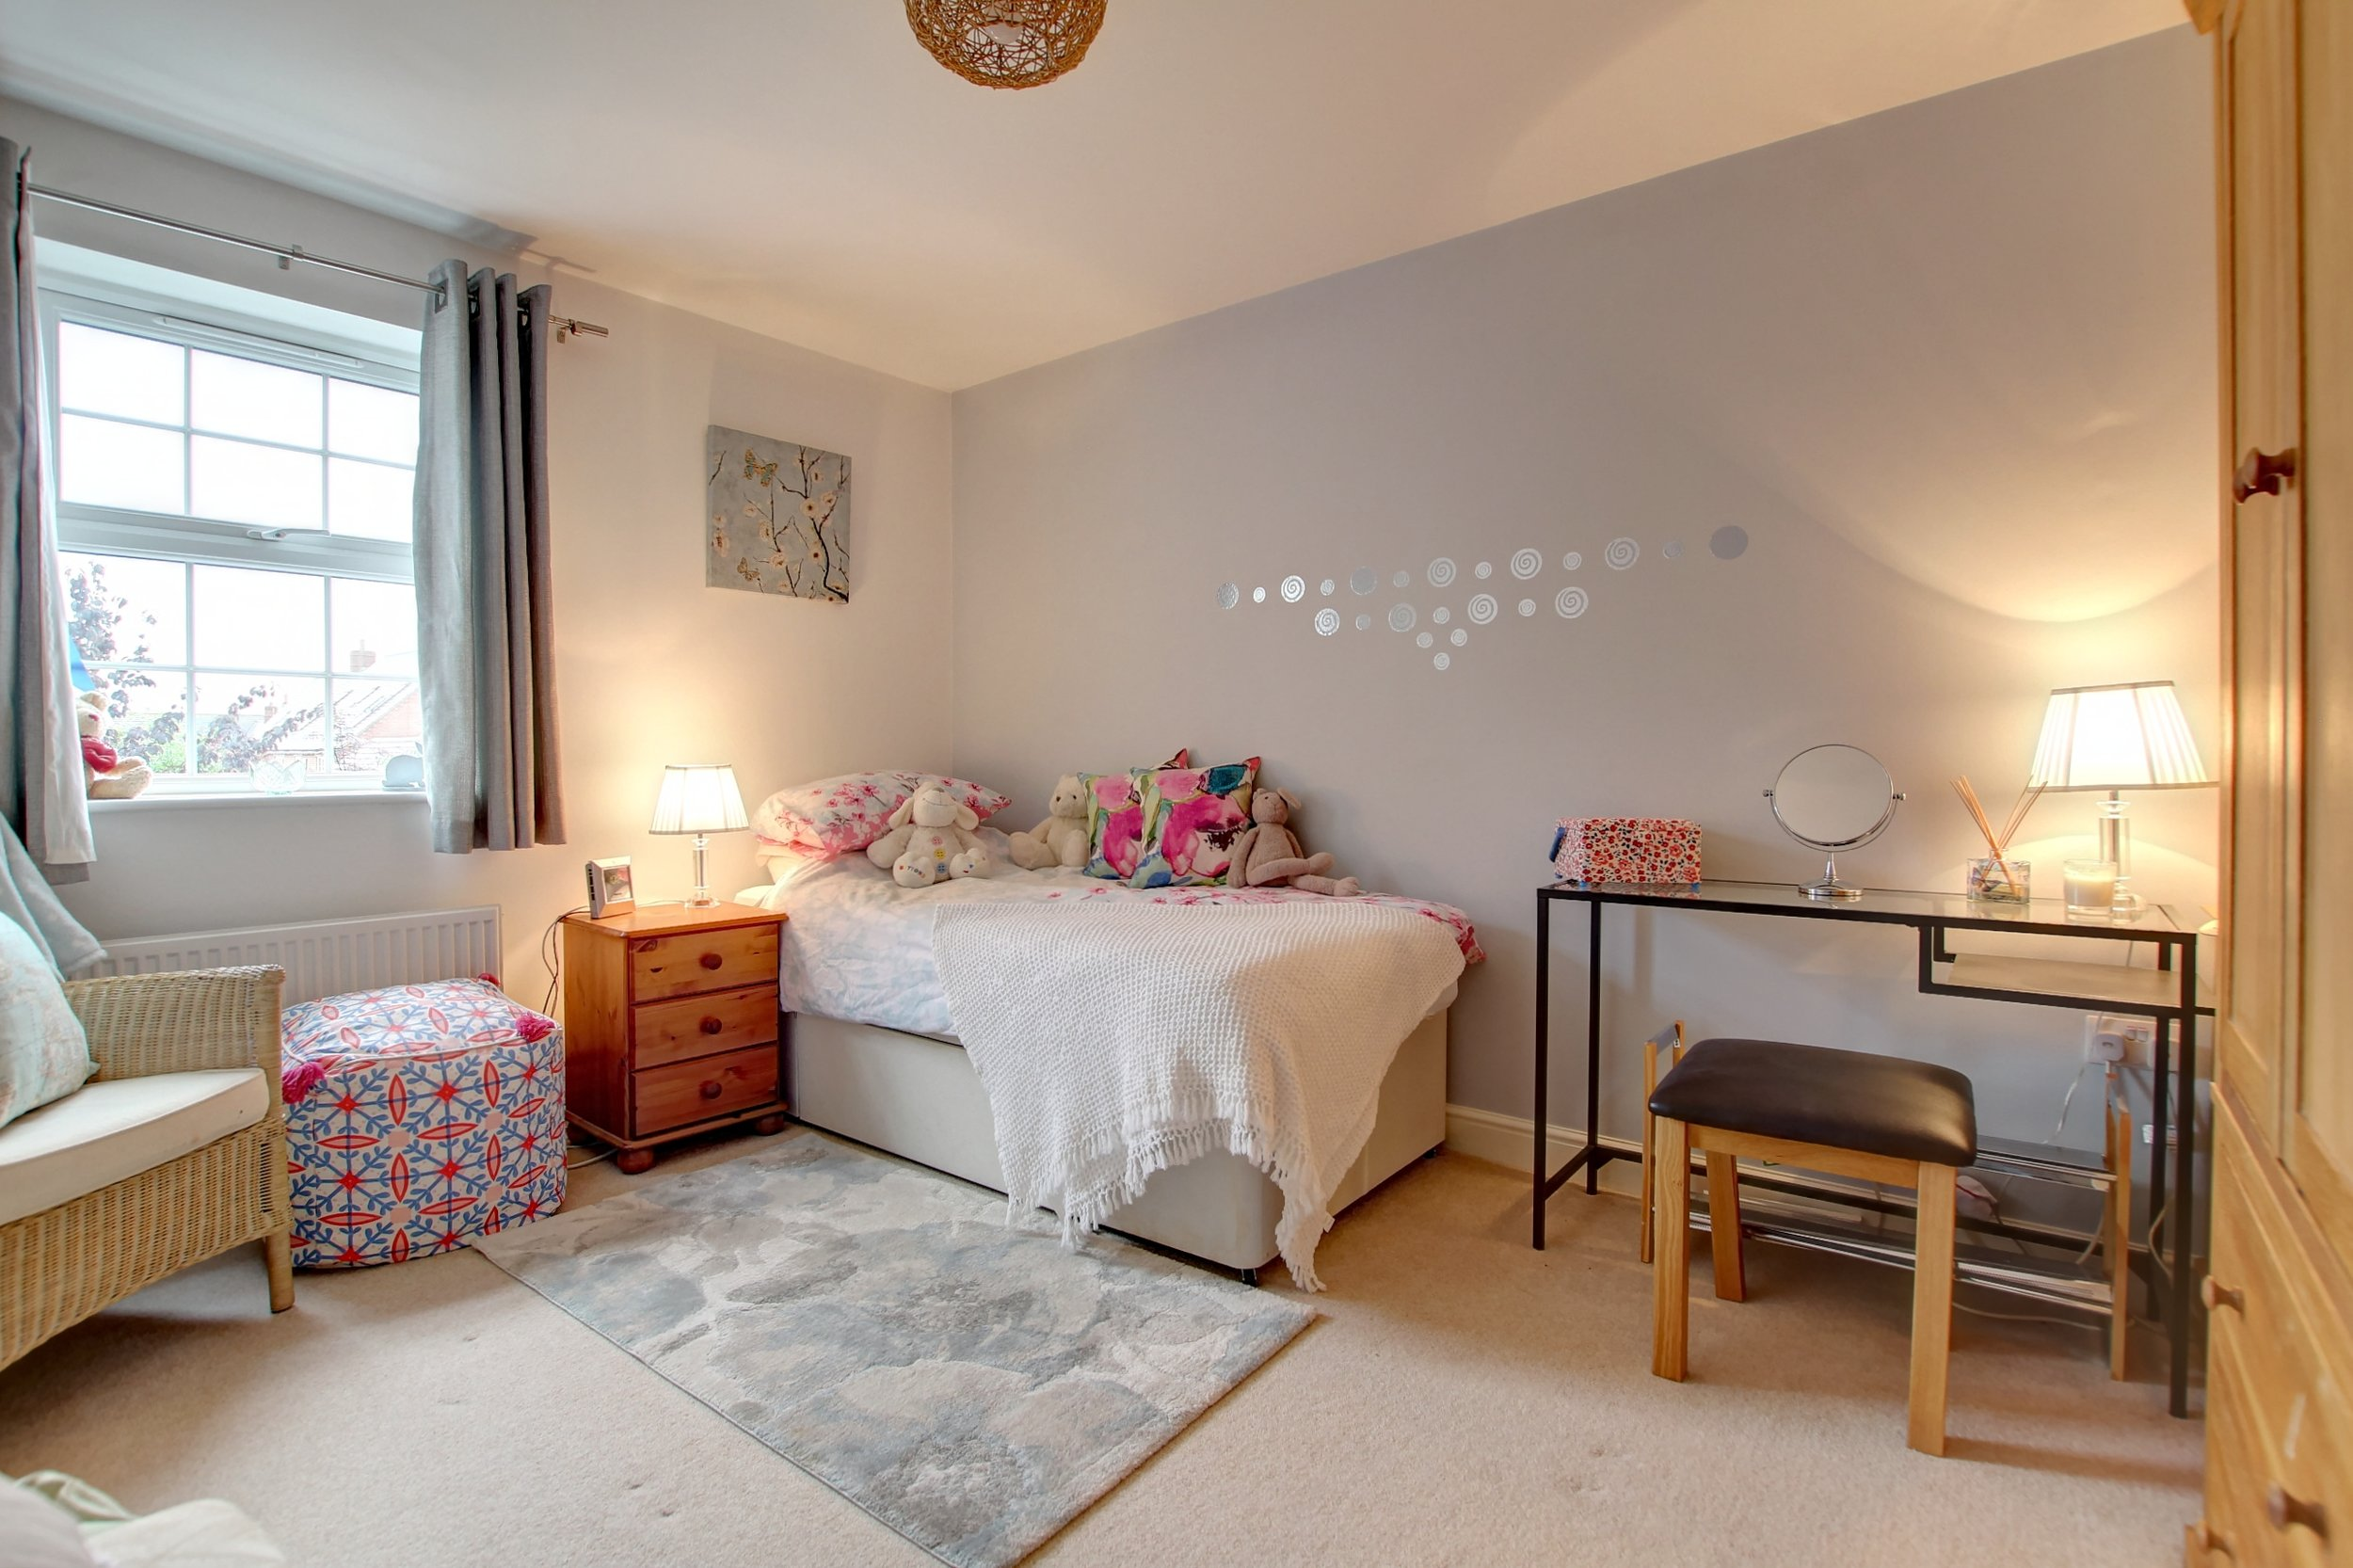 10 bedroom three.jpg